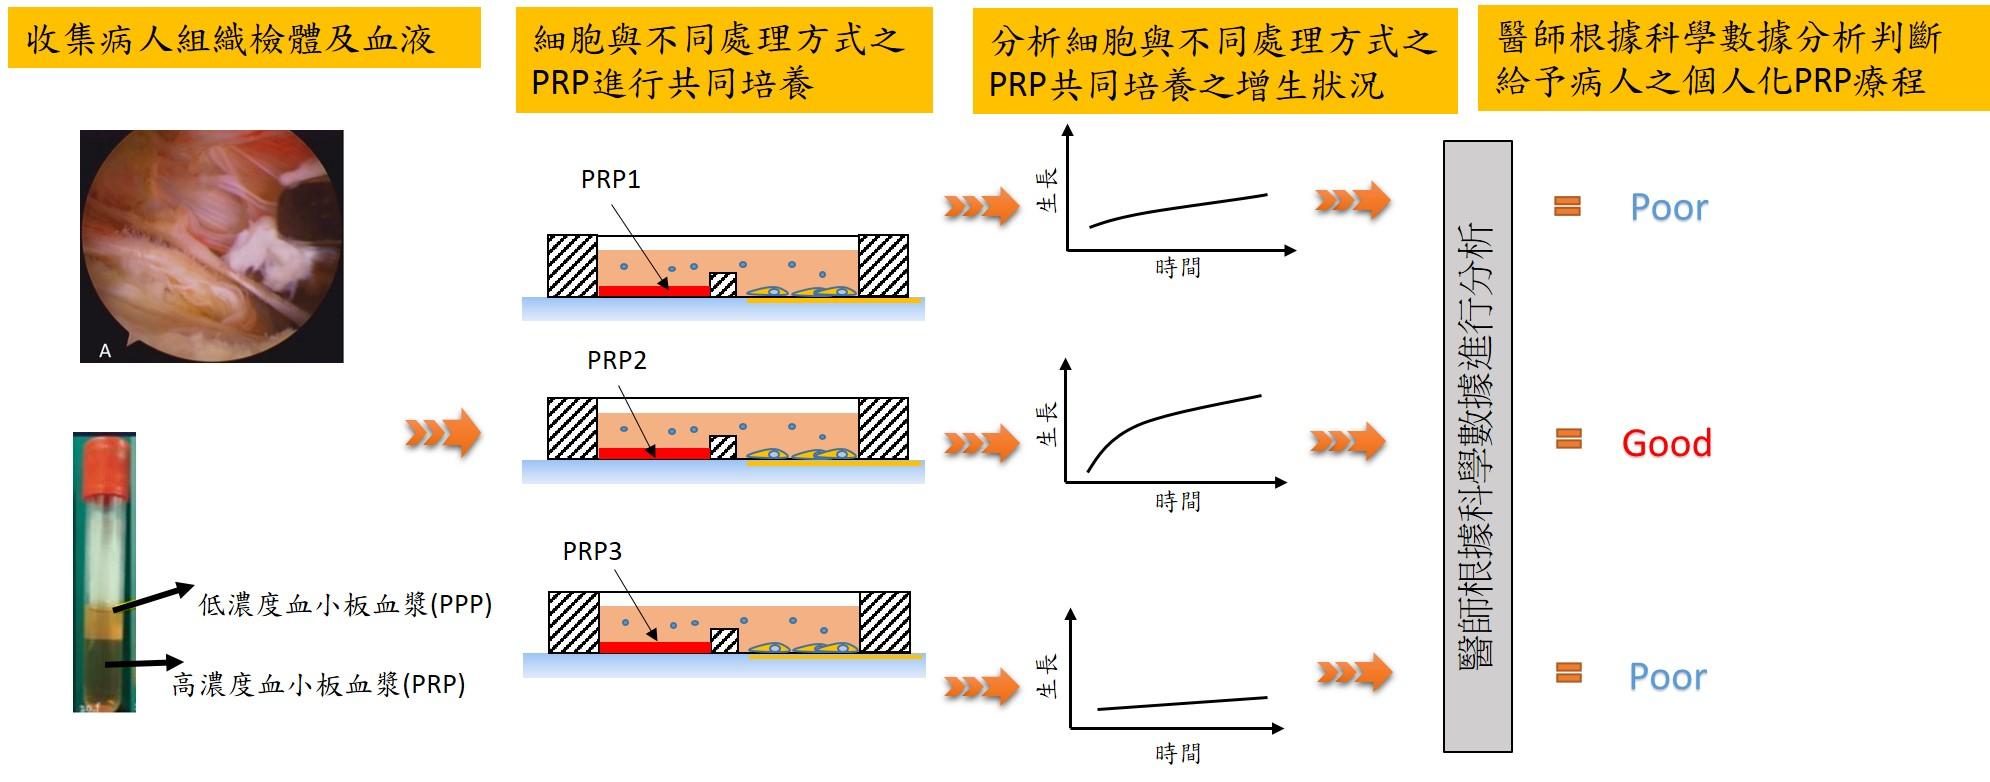 Optimization of Platelet-rich Plasma (PRP) Prolotherapy